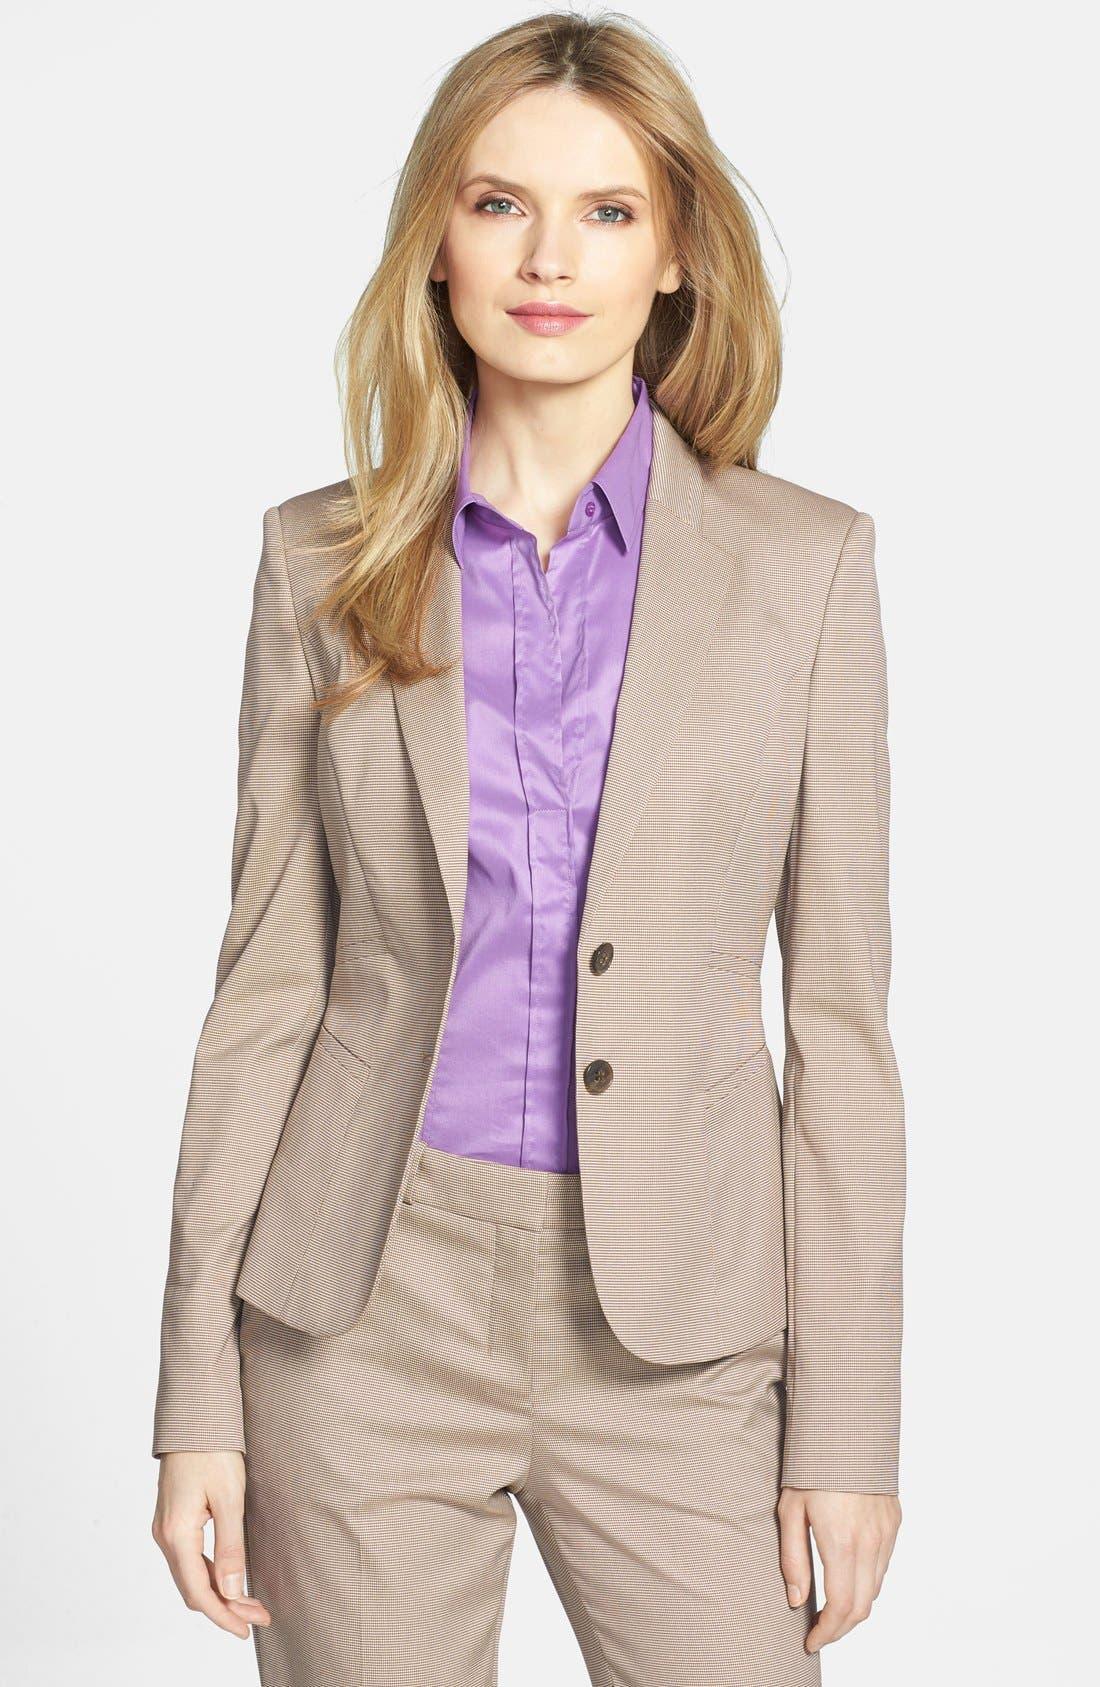 Alternate Image 1 Selected - BOSS 'Jirella' Suiting Jacket